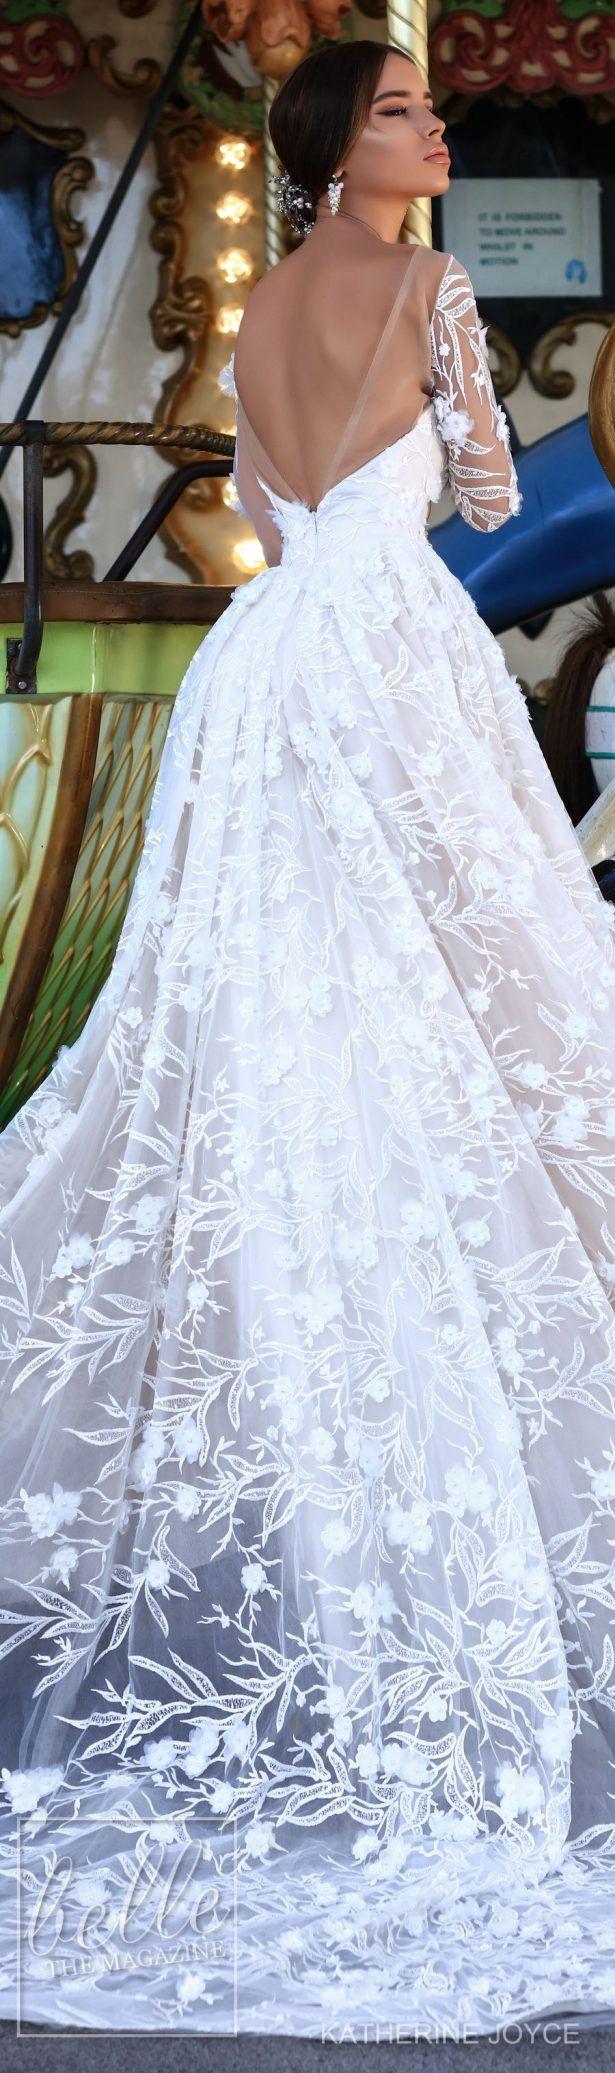 Green and white wedding dress  Wedding Dresses by Katherine Joyce Bridal Ma Cheri Collection